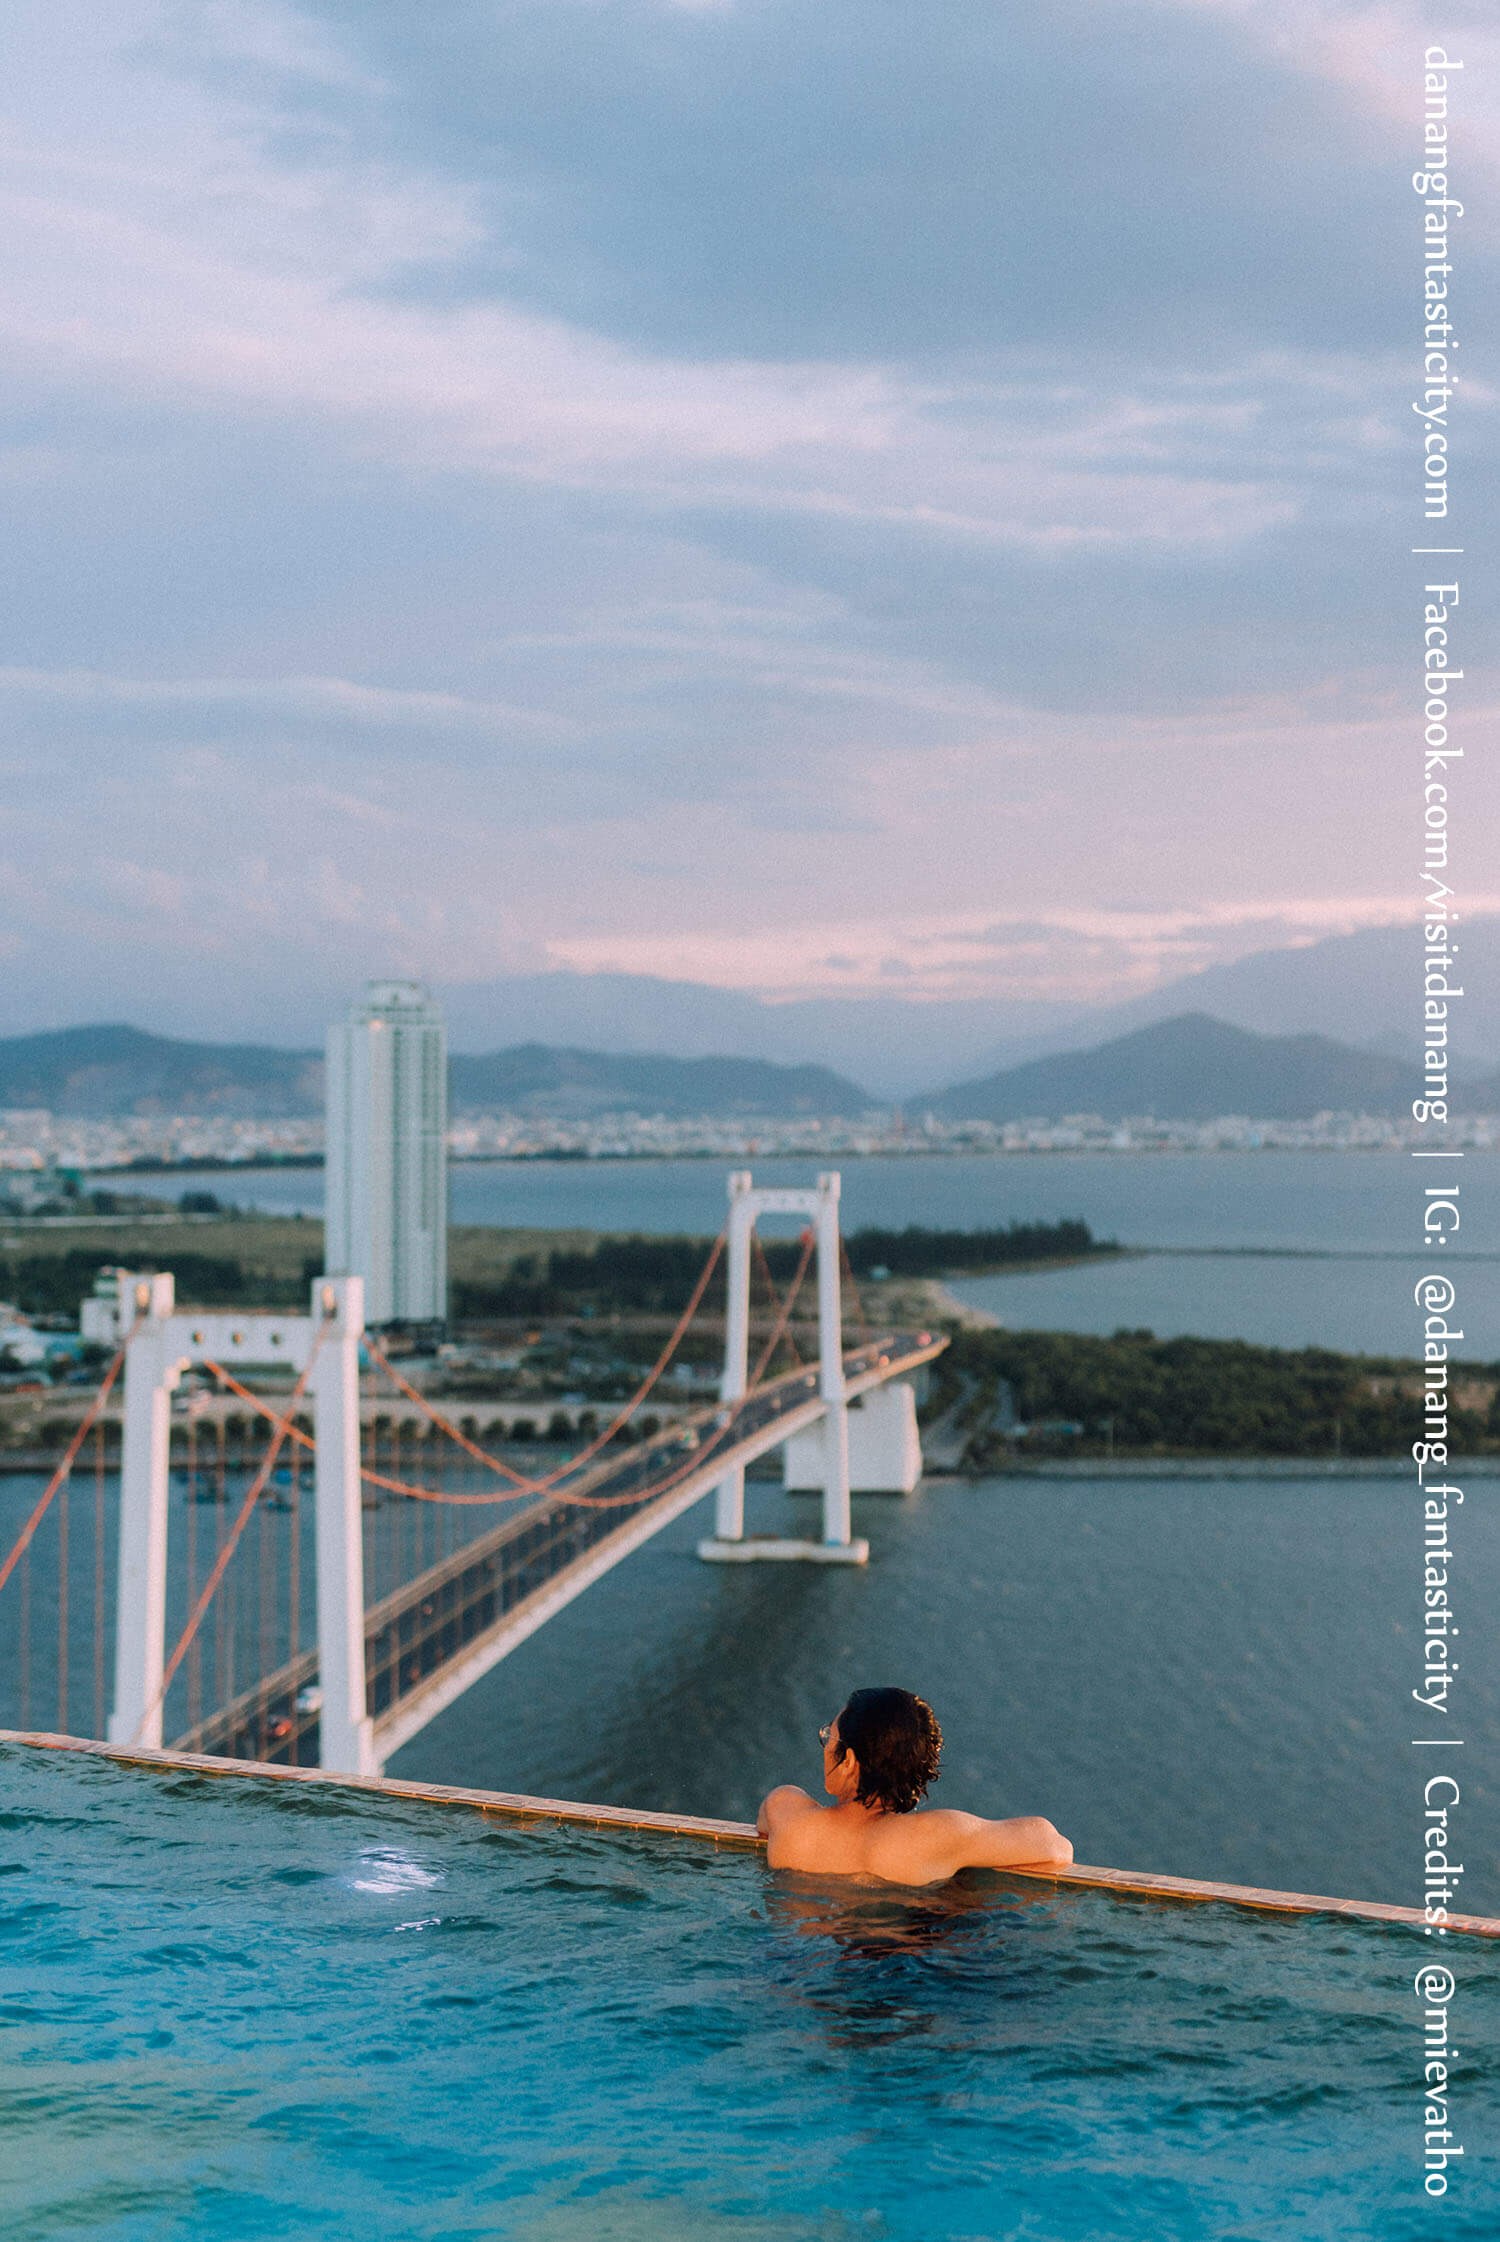 Danang Golden Bay Hoang Hon Vang Cua Da Nang Fantasticity Com 010